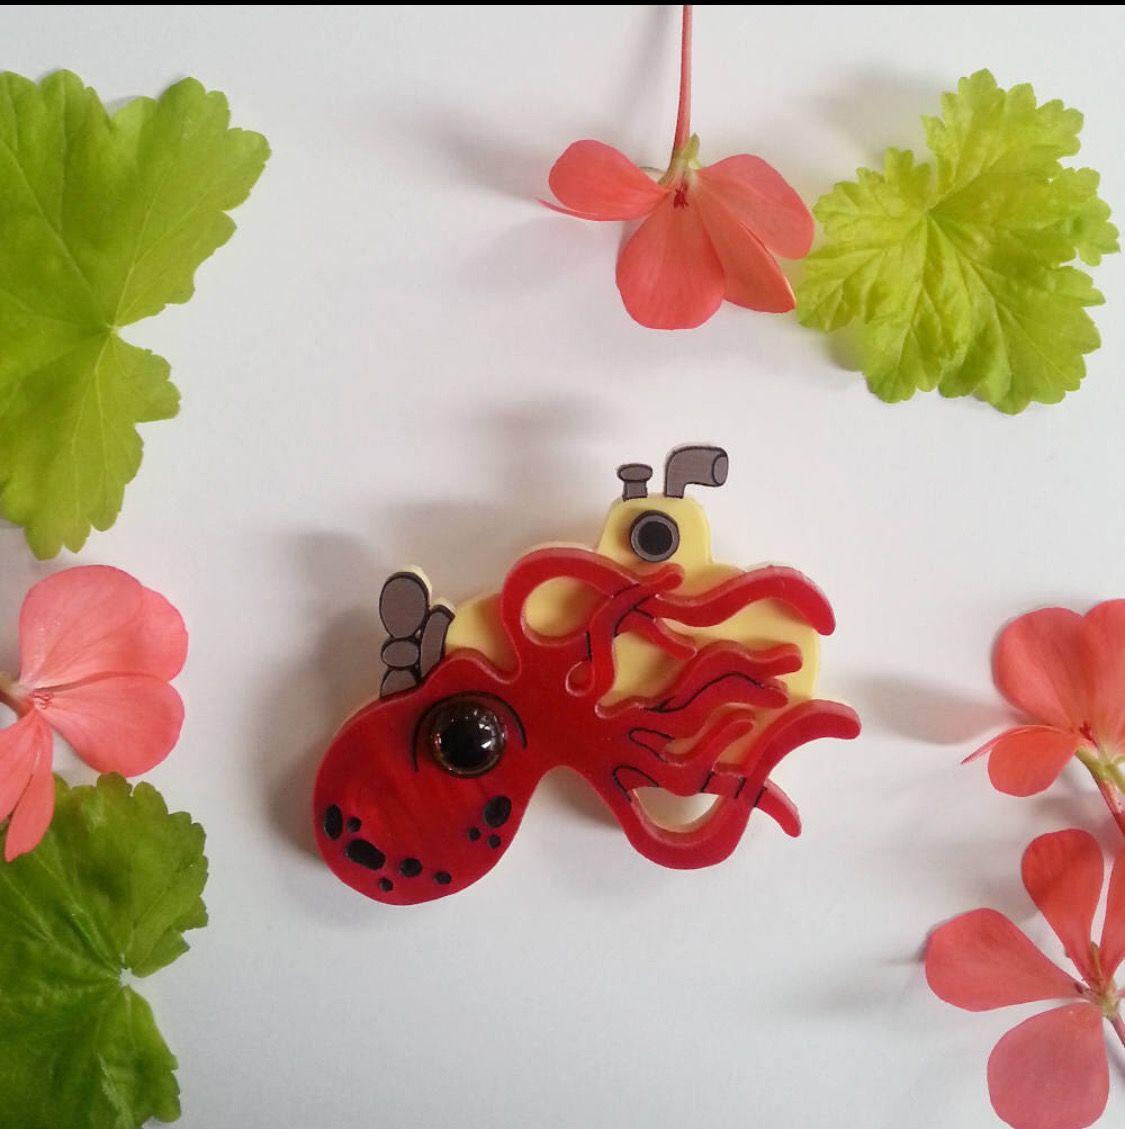 Kitchen Window Edition Nana/'s Cucumber Pickles Wearable Art Brooch by Winnifreds Daughter